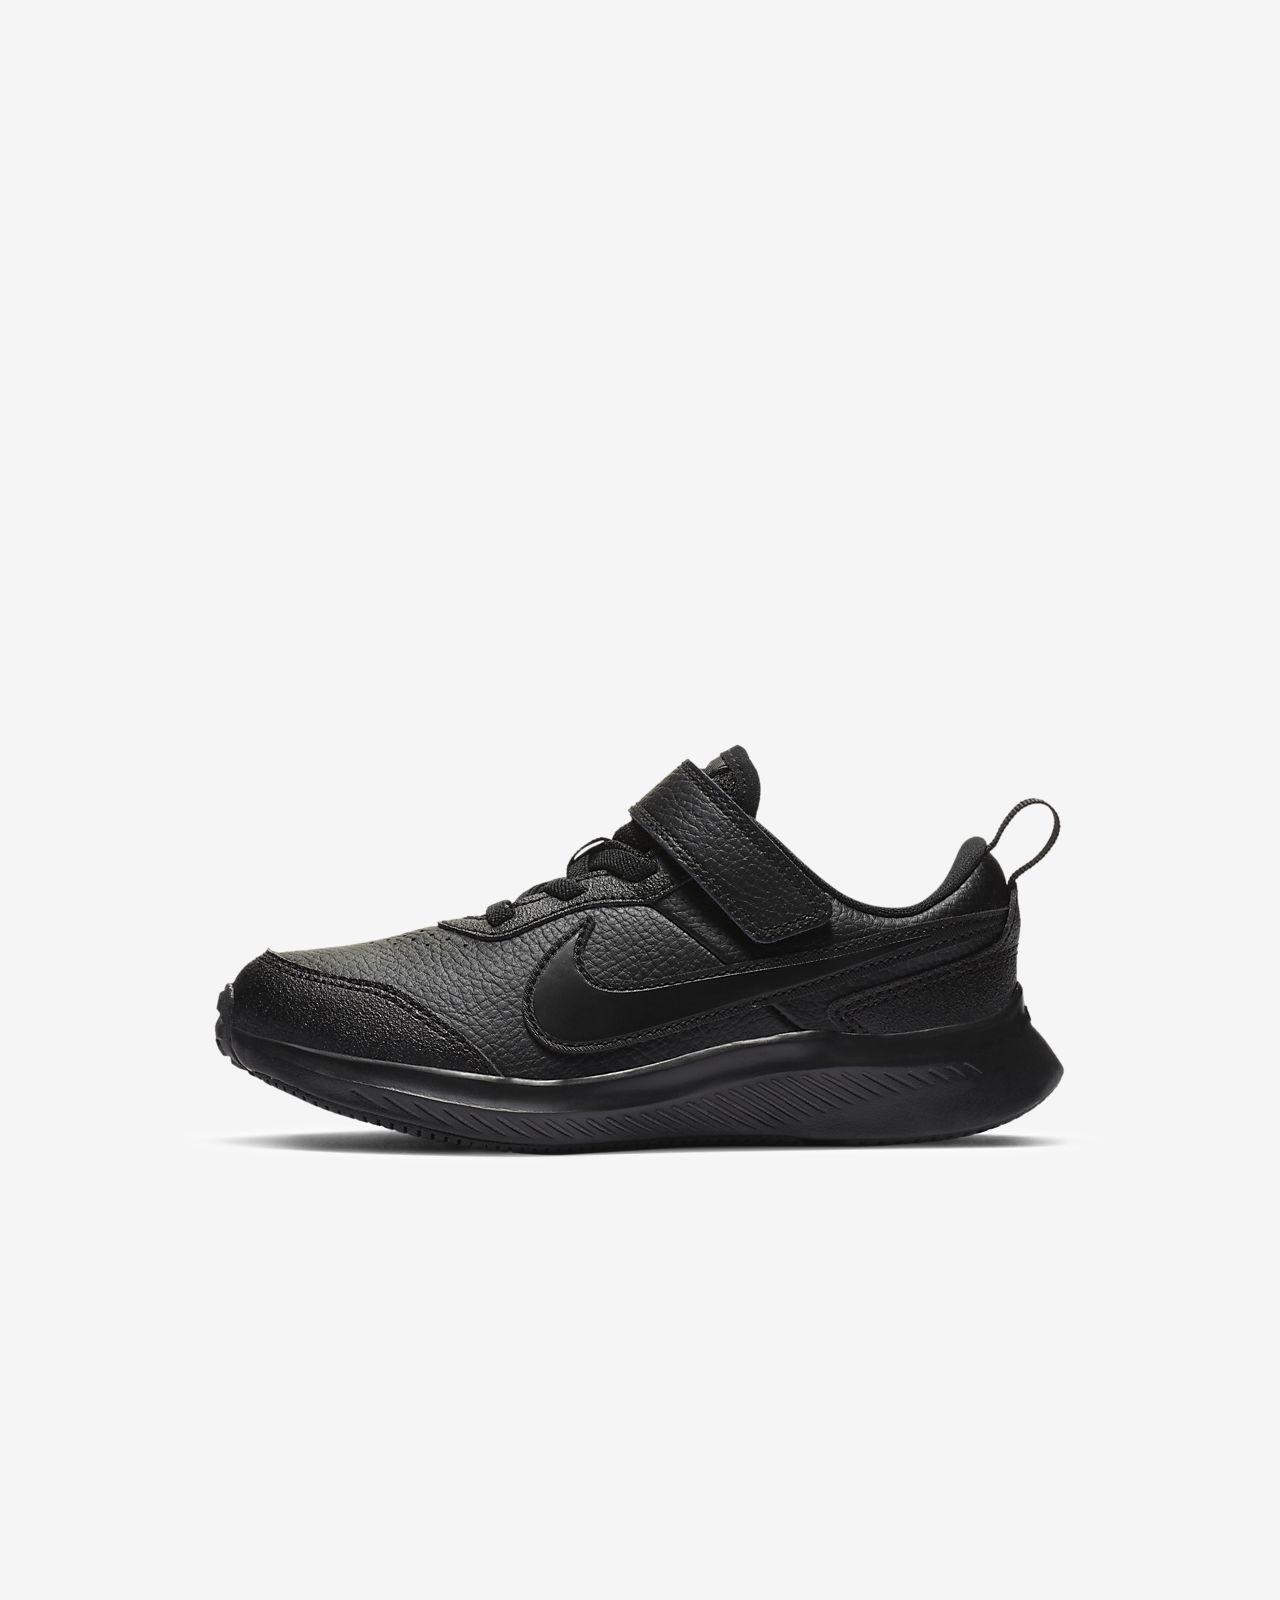 Nike Varsity Zapatillas - Niño/a pequeño/a